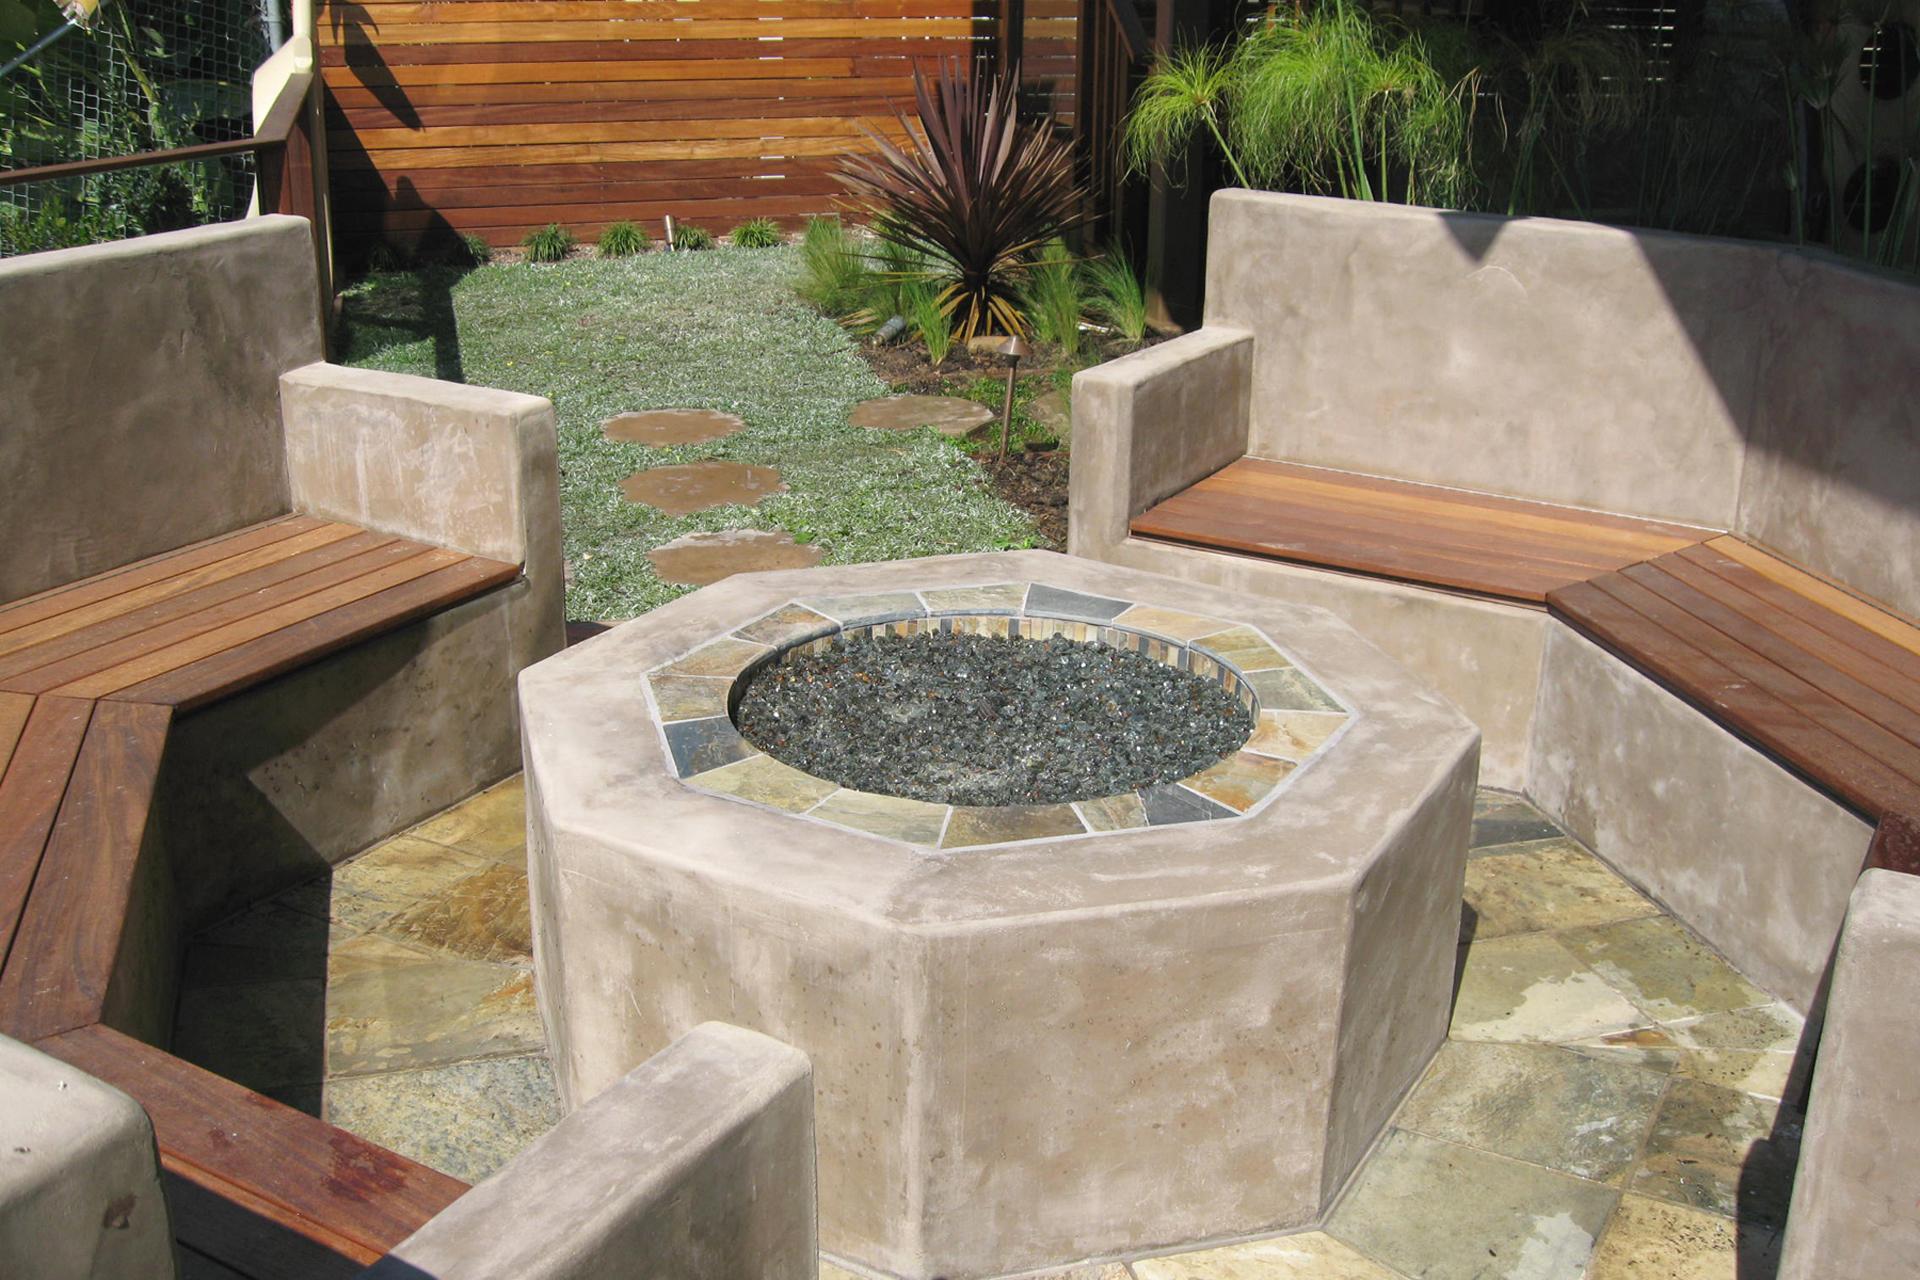 Octagon Shape Fire Pit with Seats.Ketti Kupper.jpg